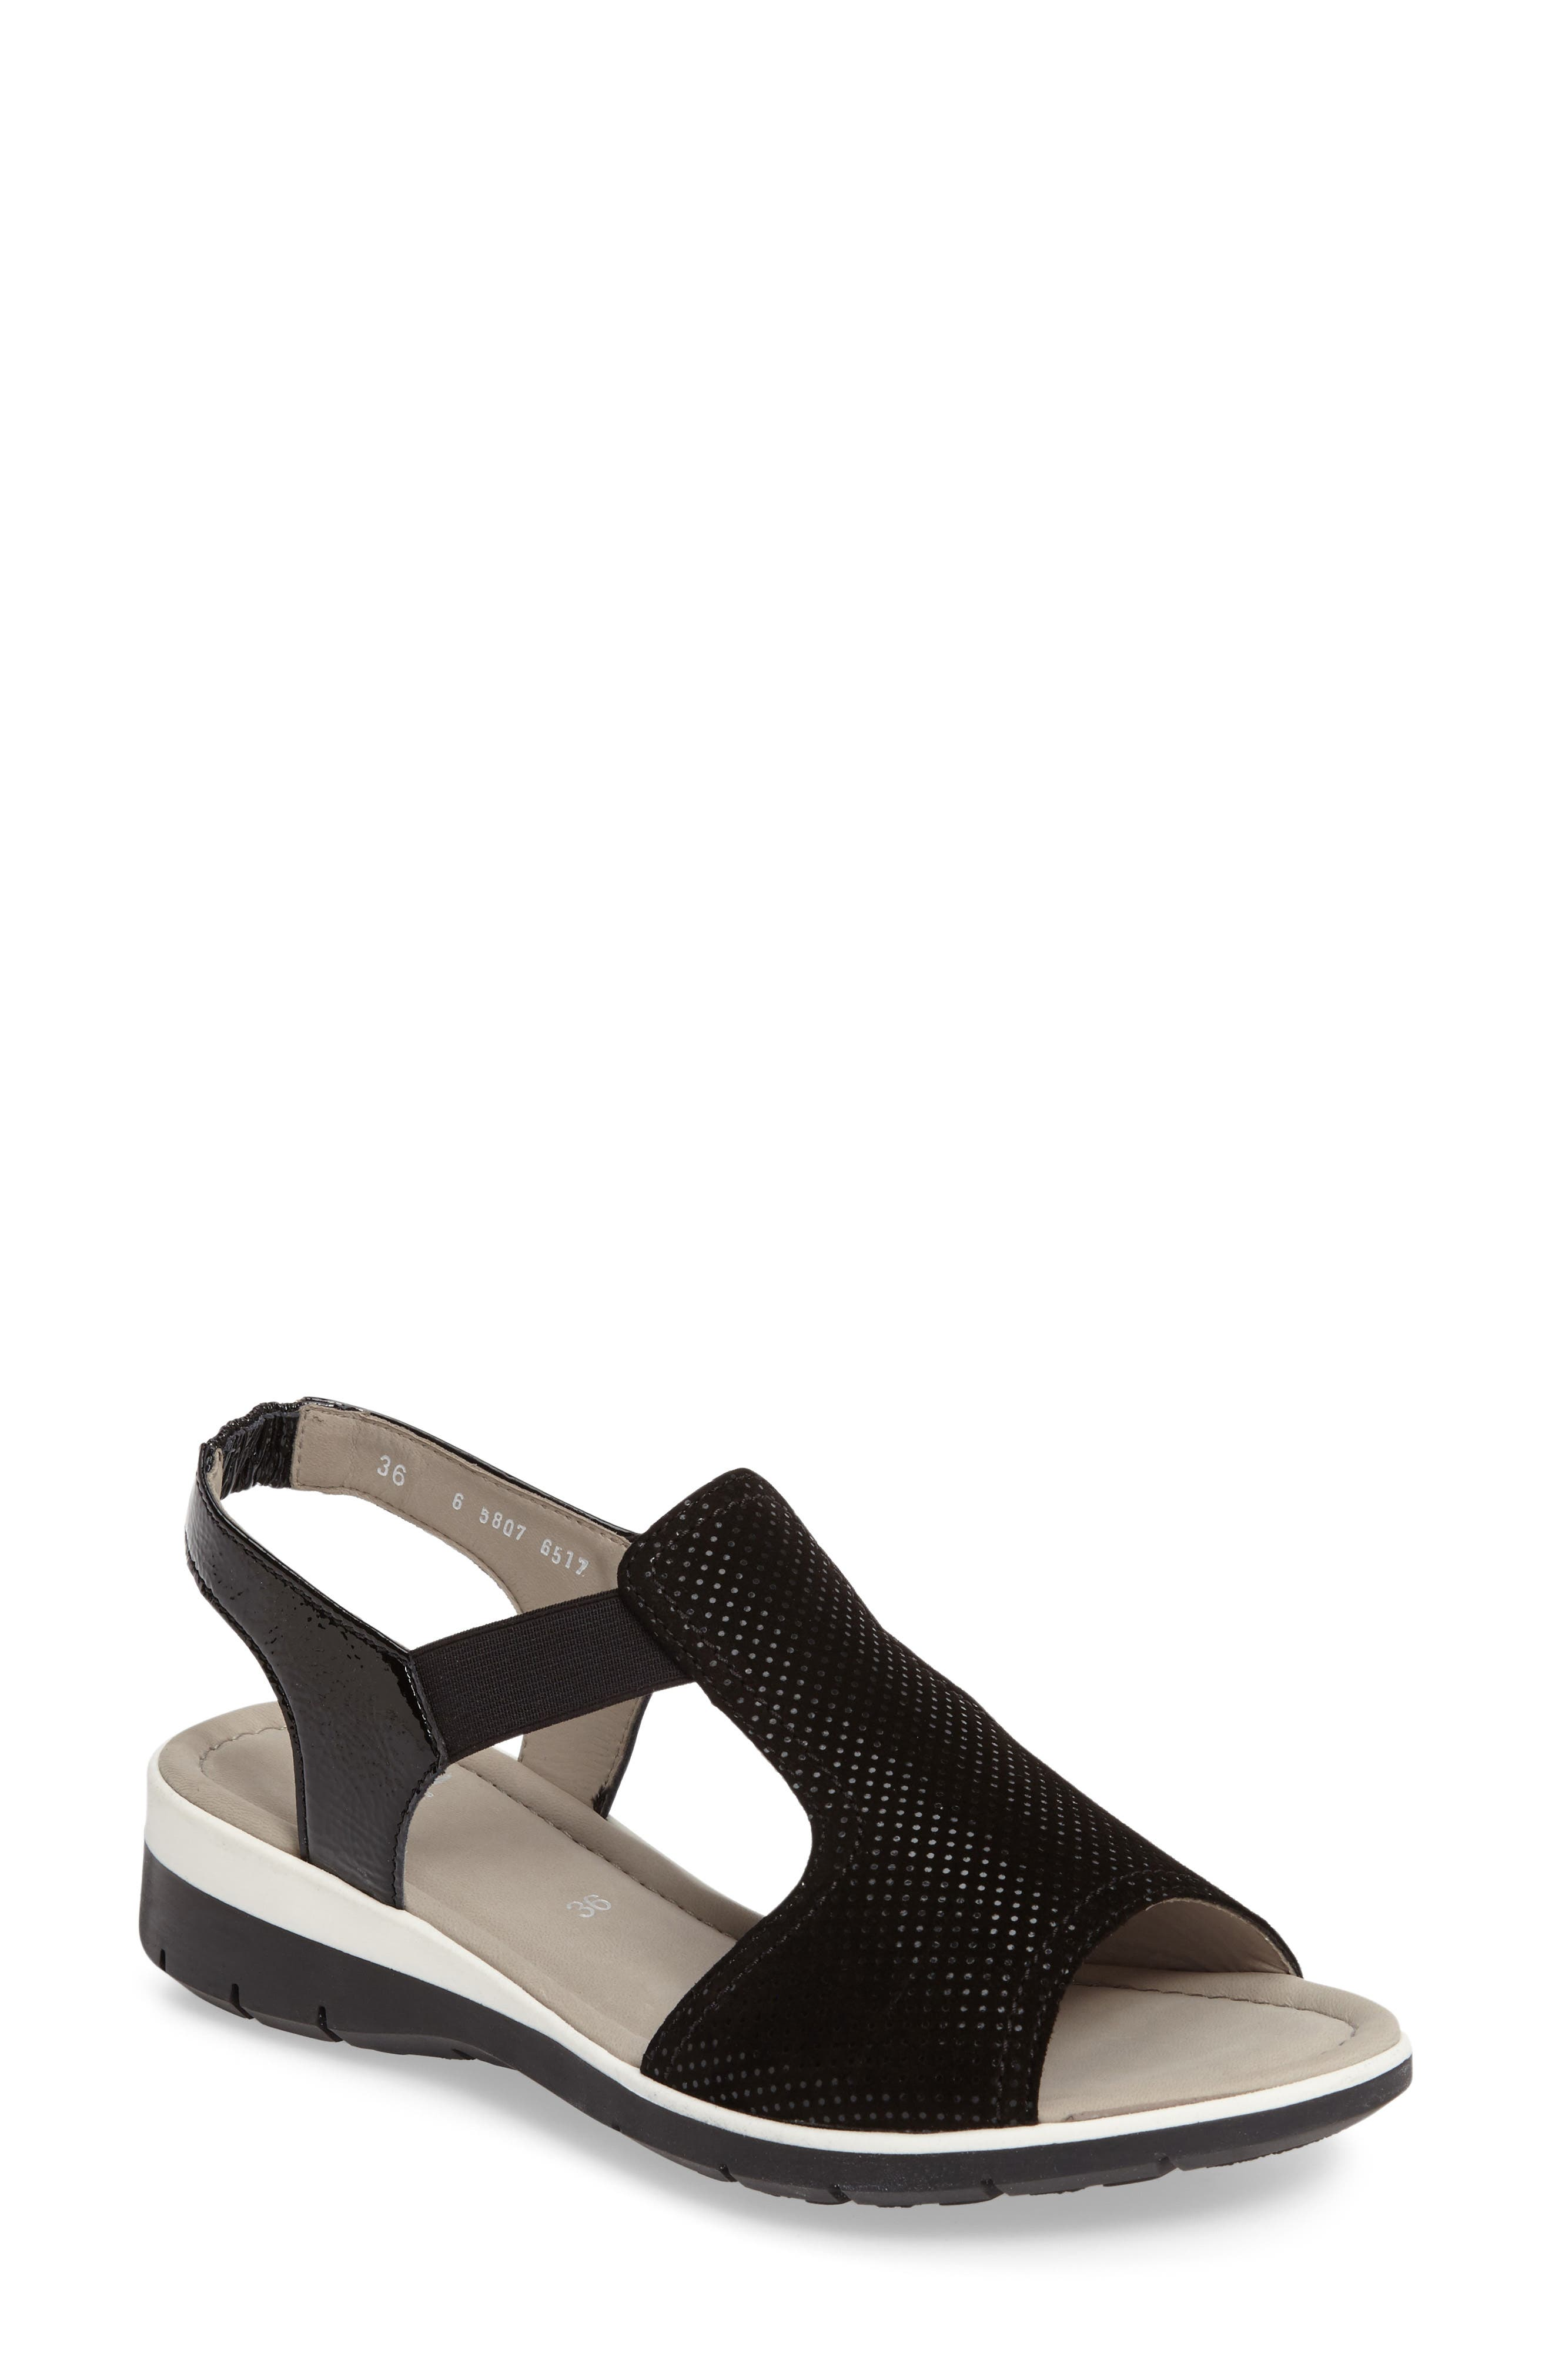 Lena Sandal,                         Main,                         color, Black Leather